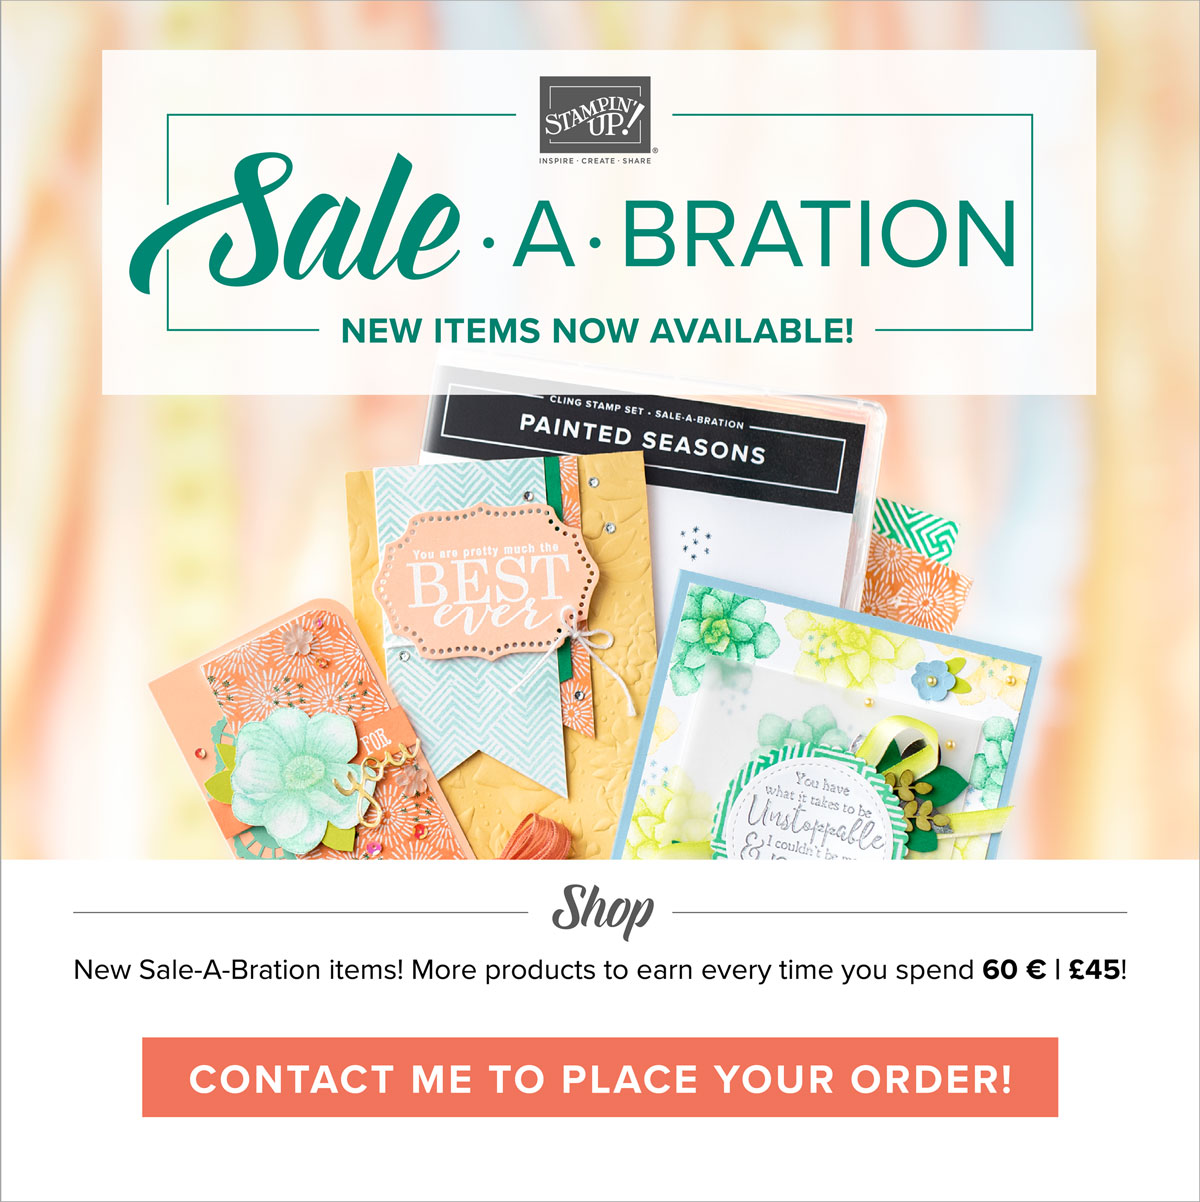 Sale-A-Bration 2019 second release